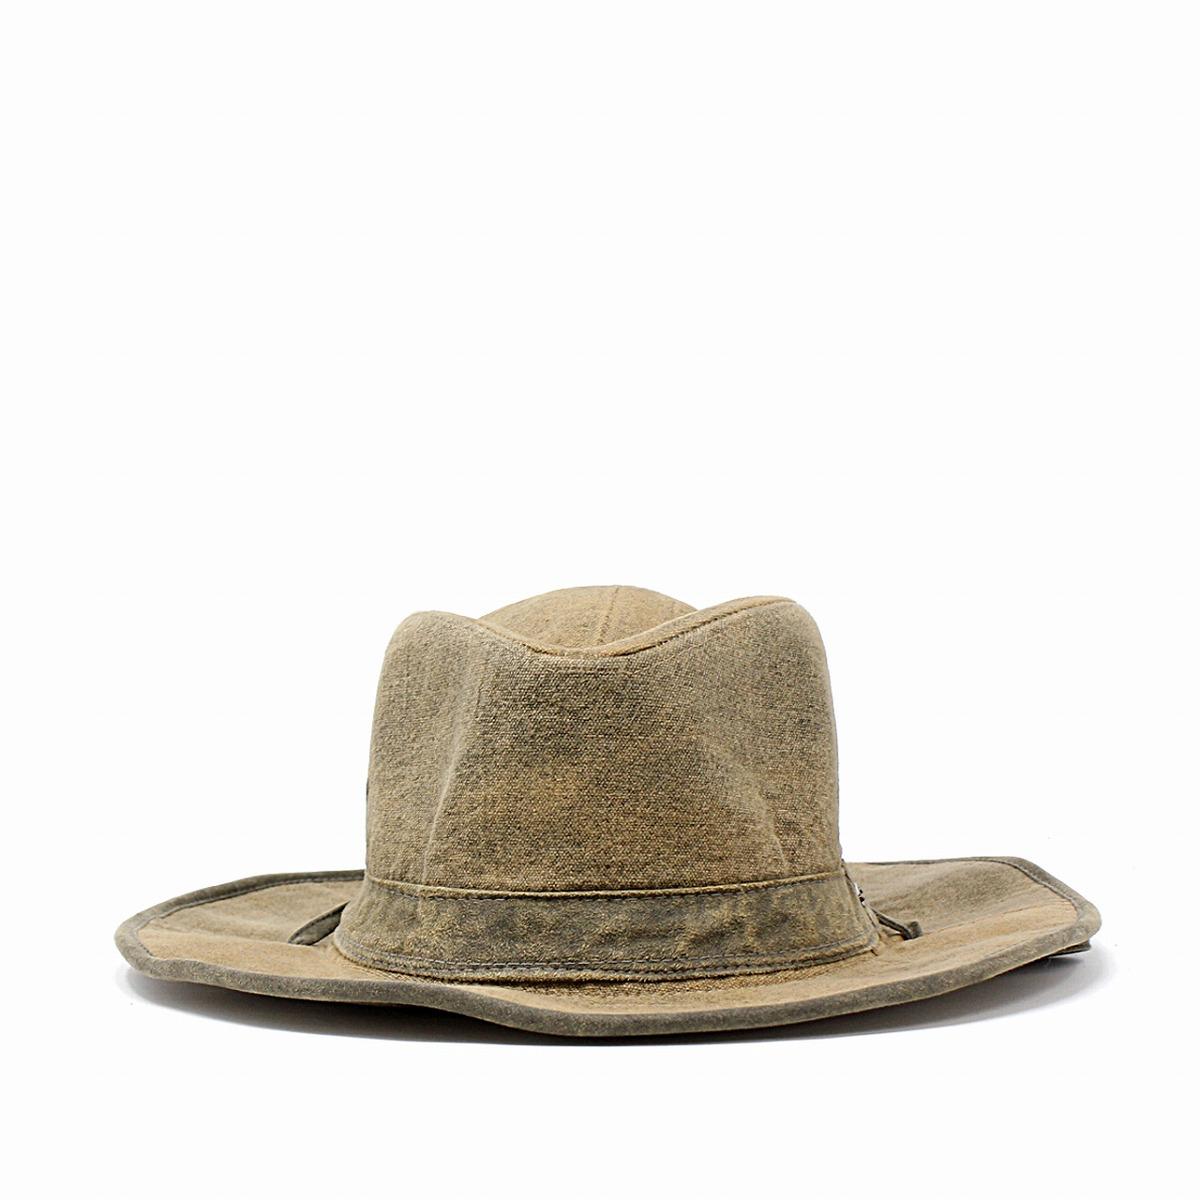 60b7db1a ... Season washing processing hat soft felt hat STETSON HAT western hat  gentleman tea brown [cowboy ...